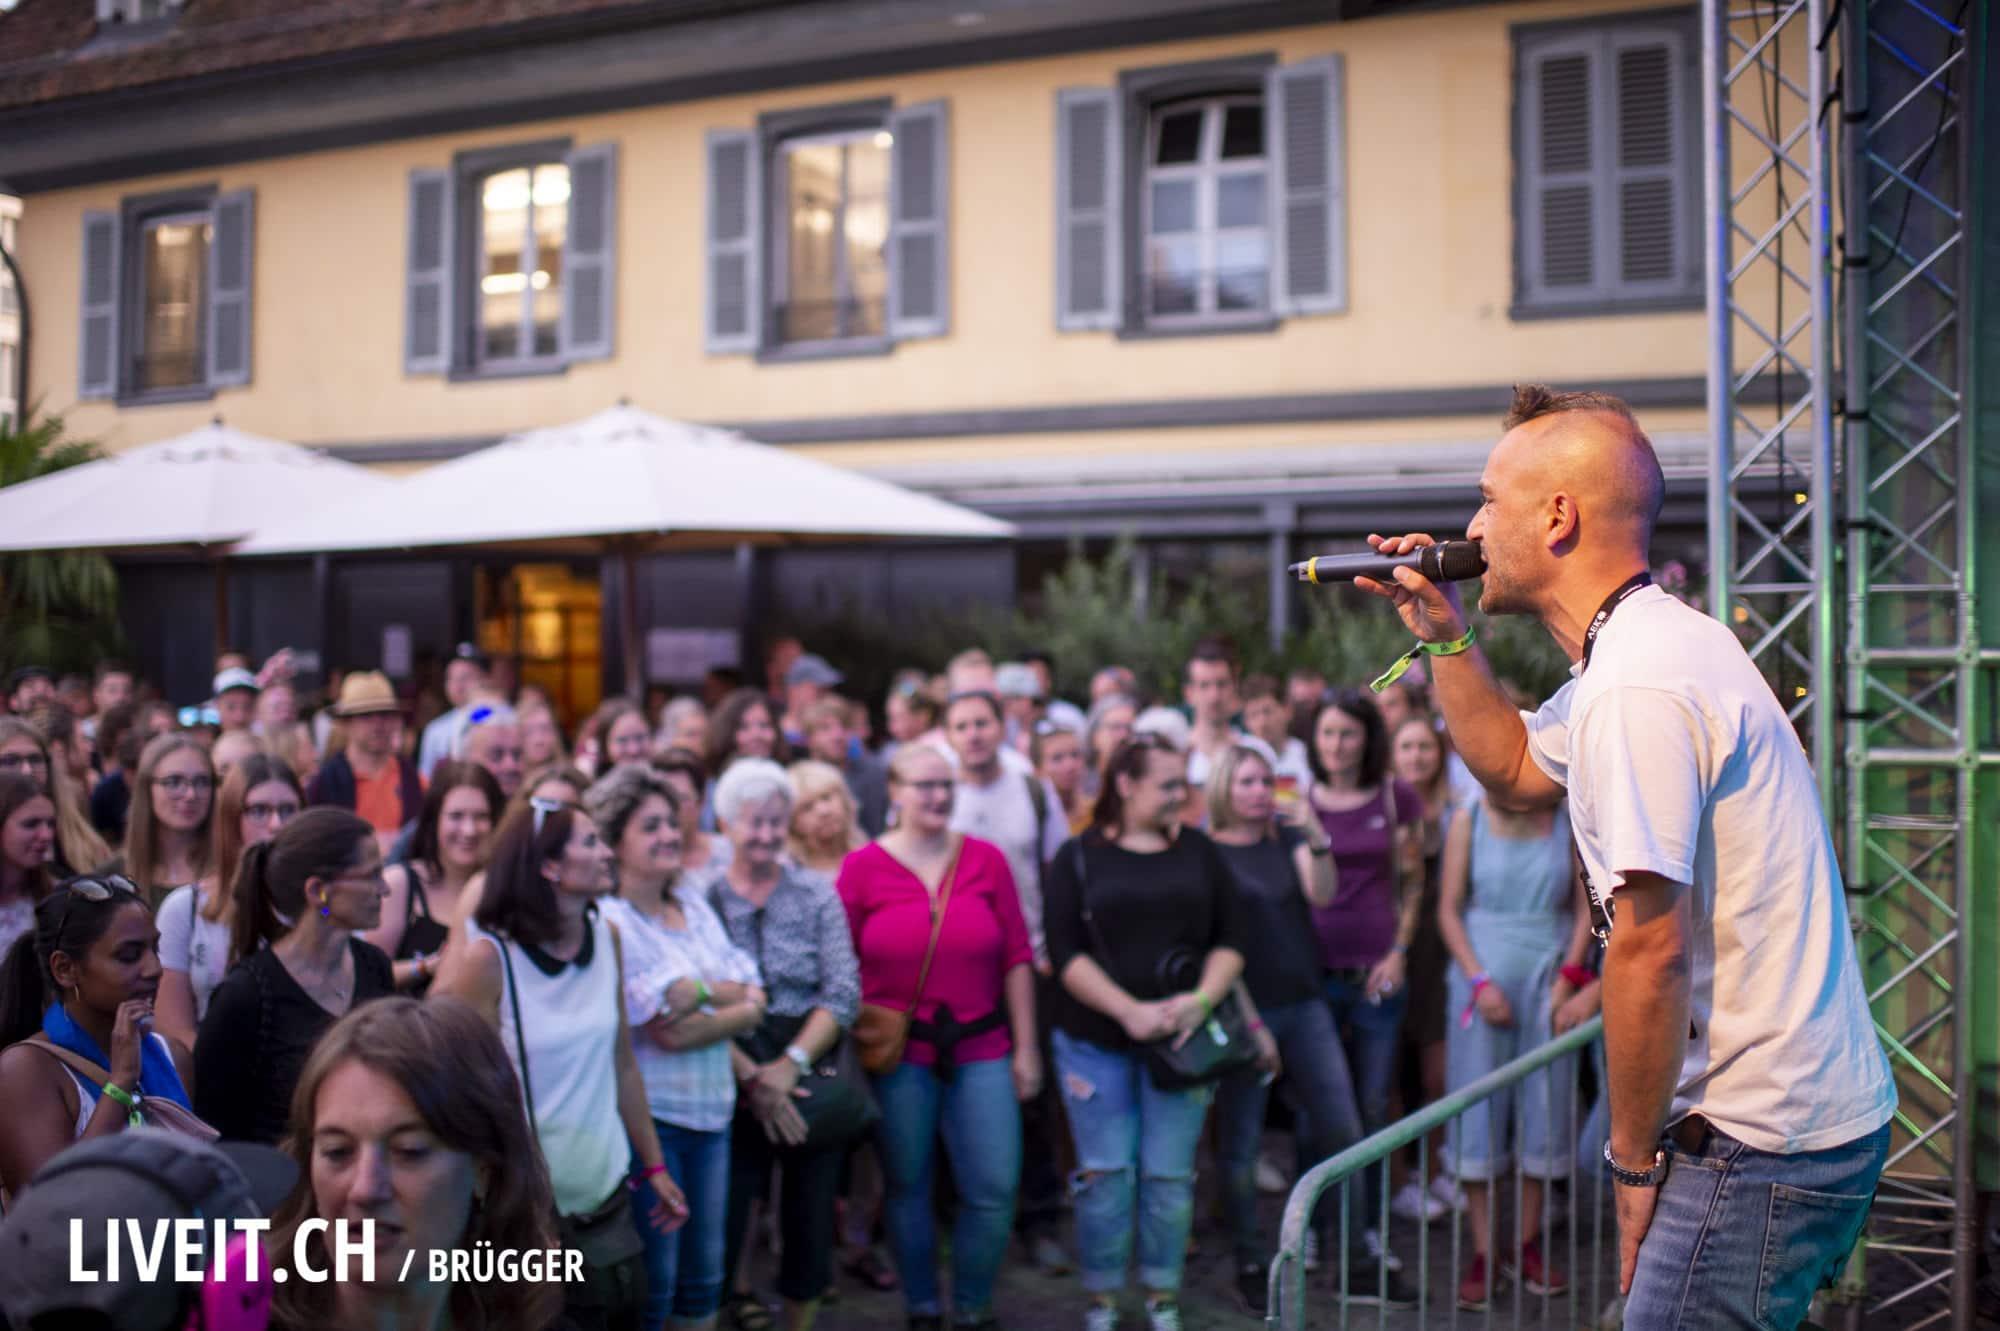 Churchhill Thunfest 2018 in Thun. (Dominic Bruegger for liveit.ch)